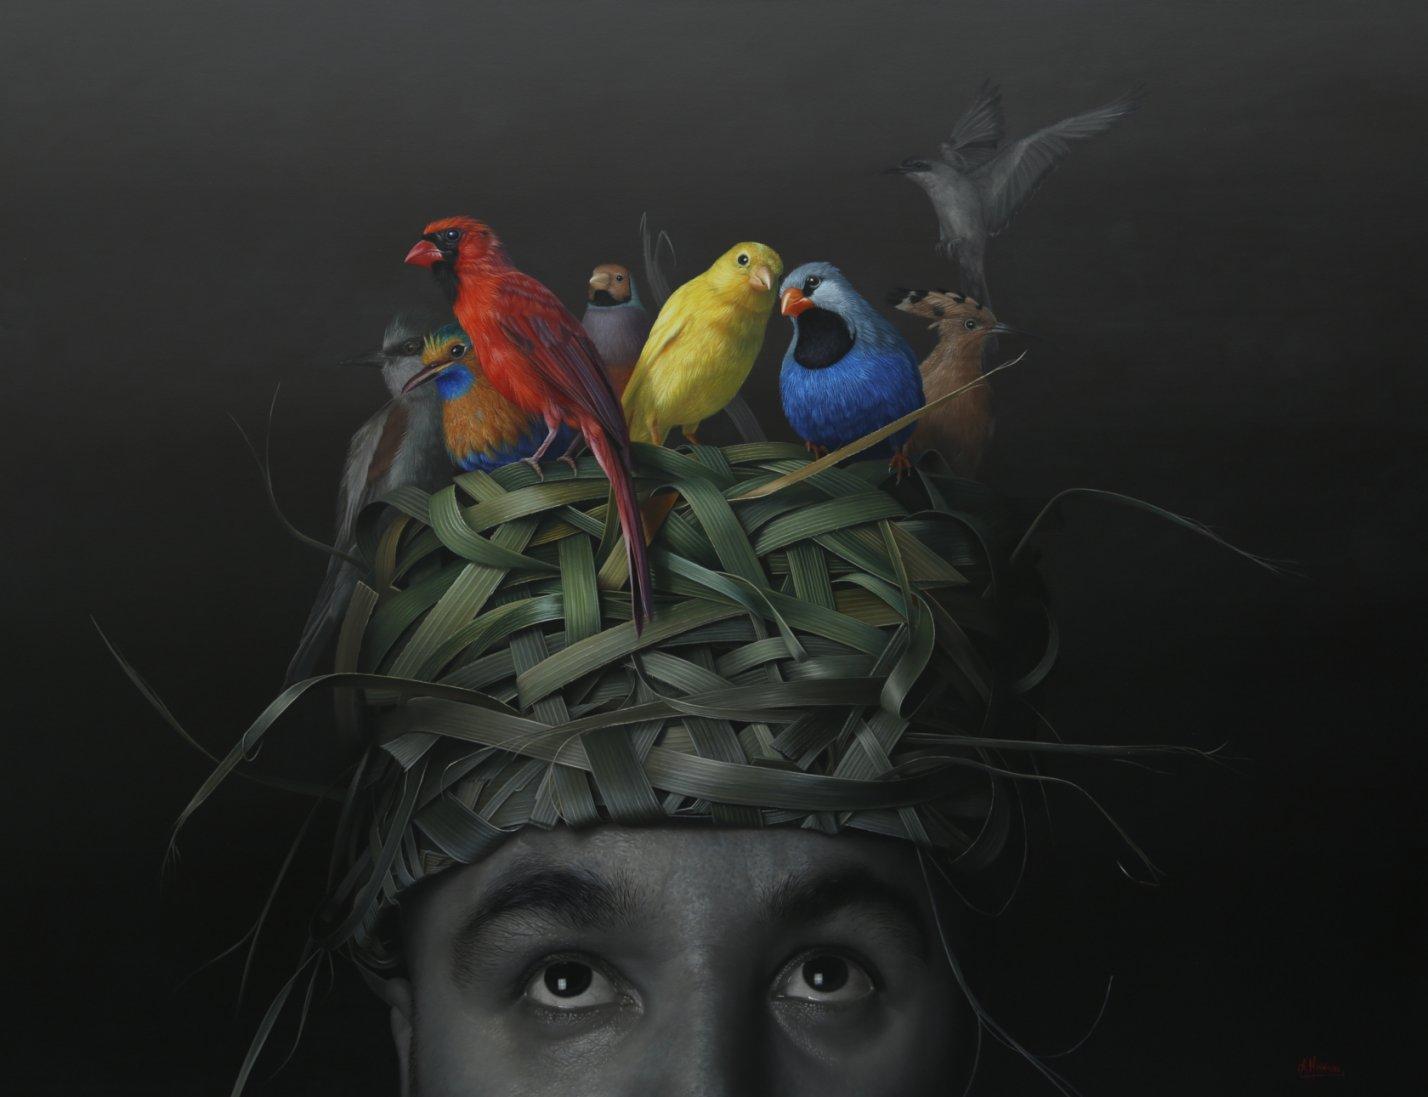 Voces Coloridas (2017) - Alexandre Monntoya